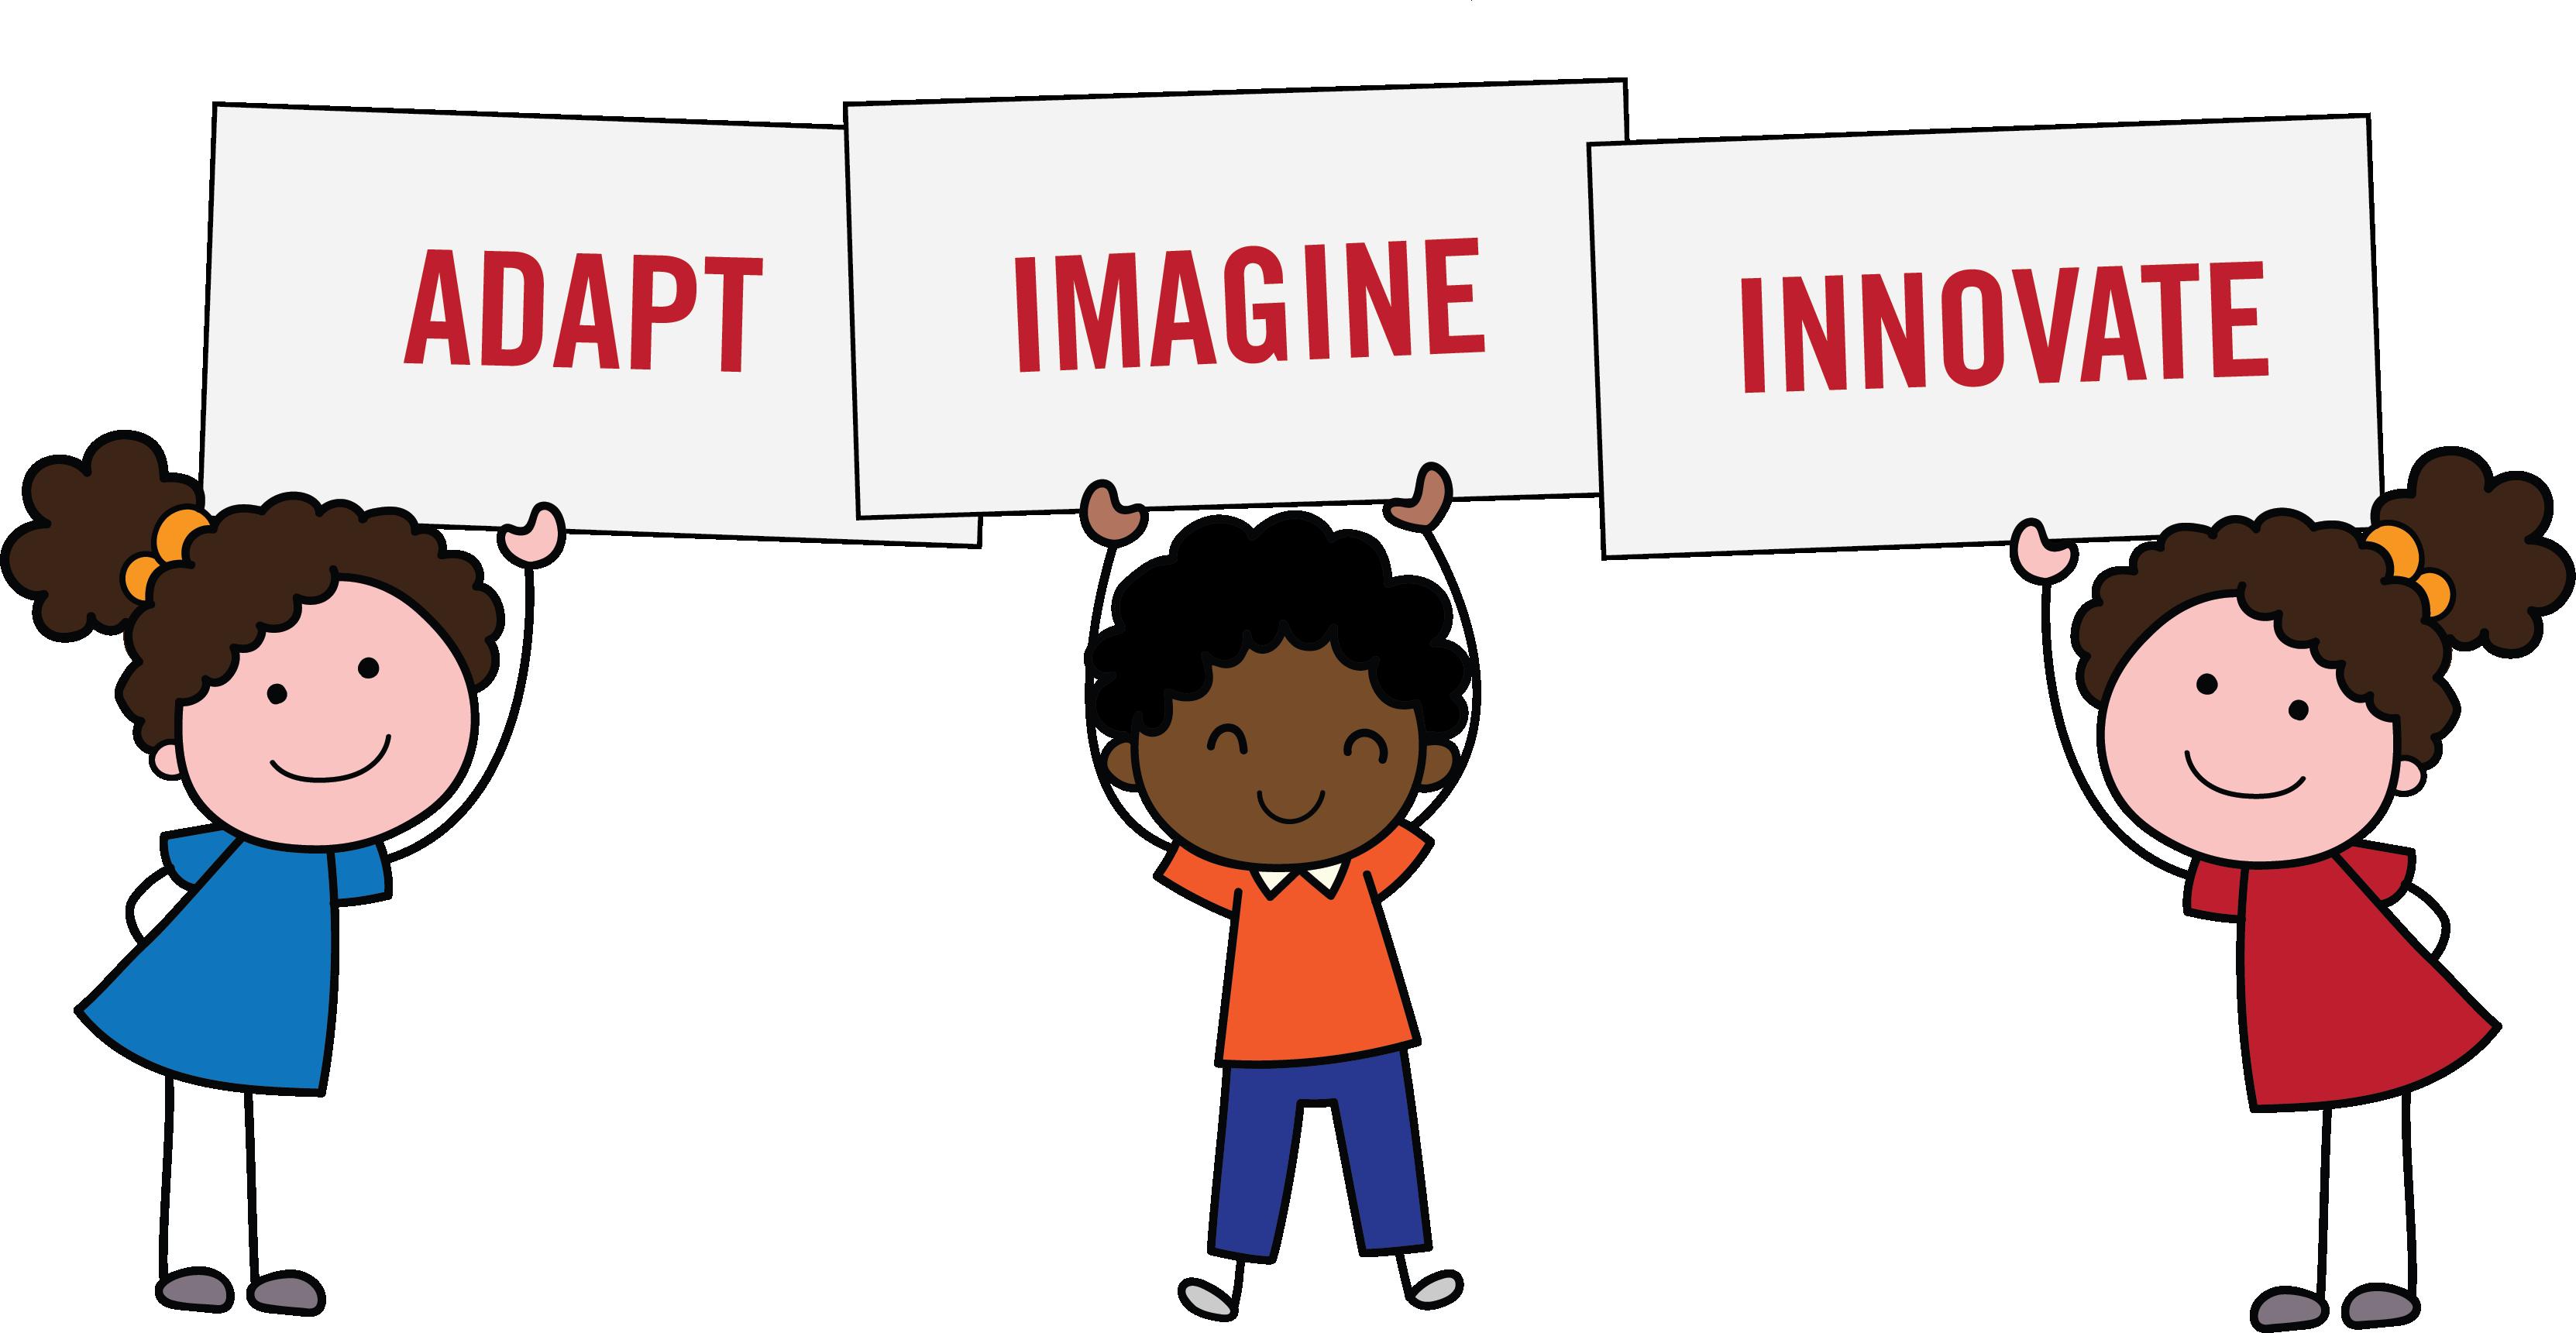 Adapt, Imagine, Innovate